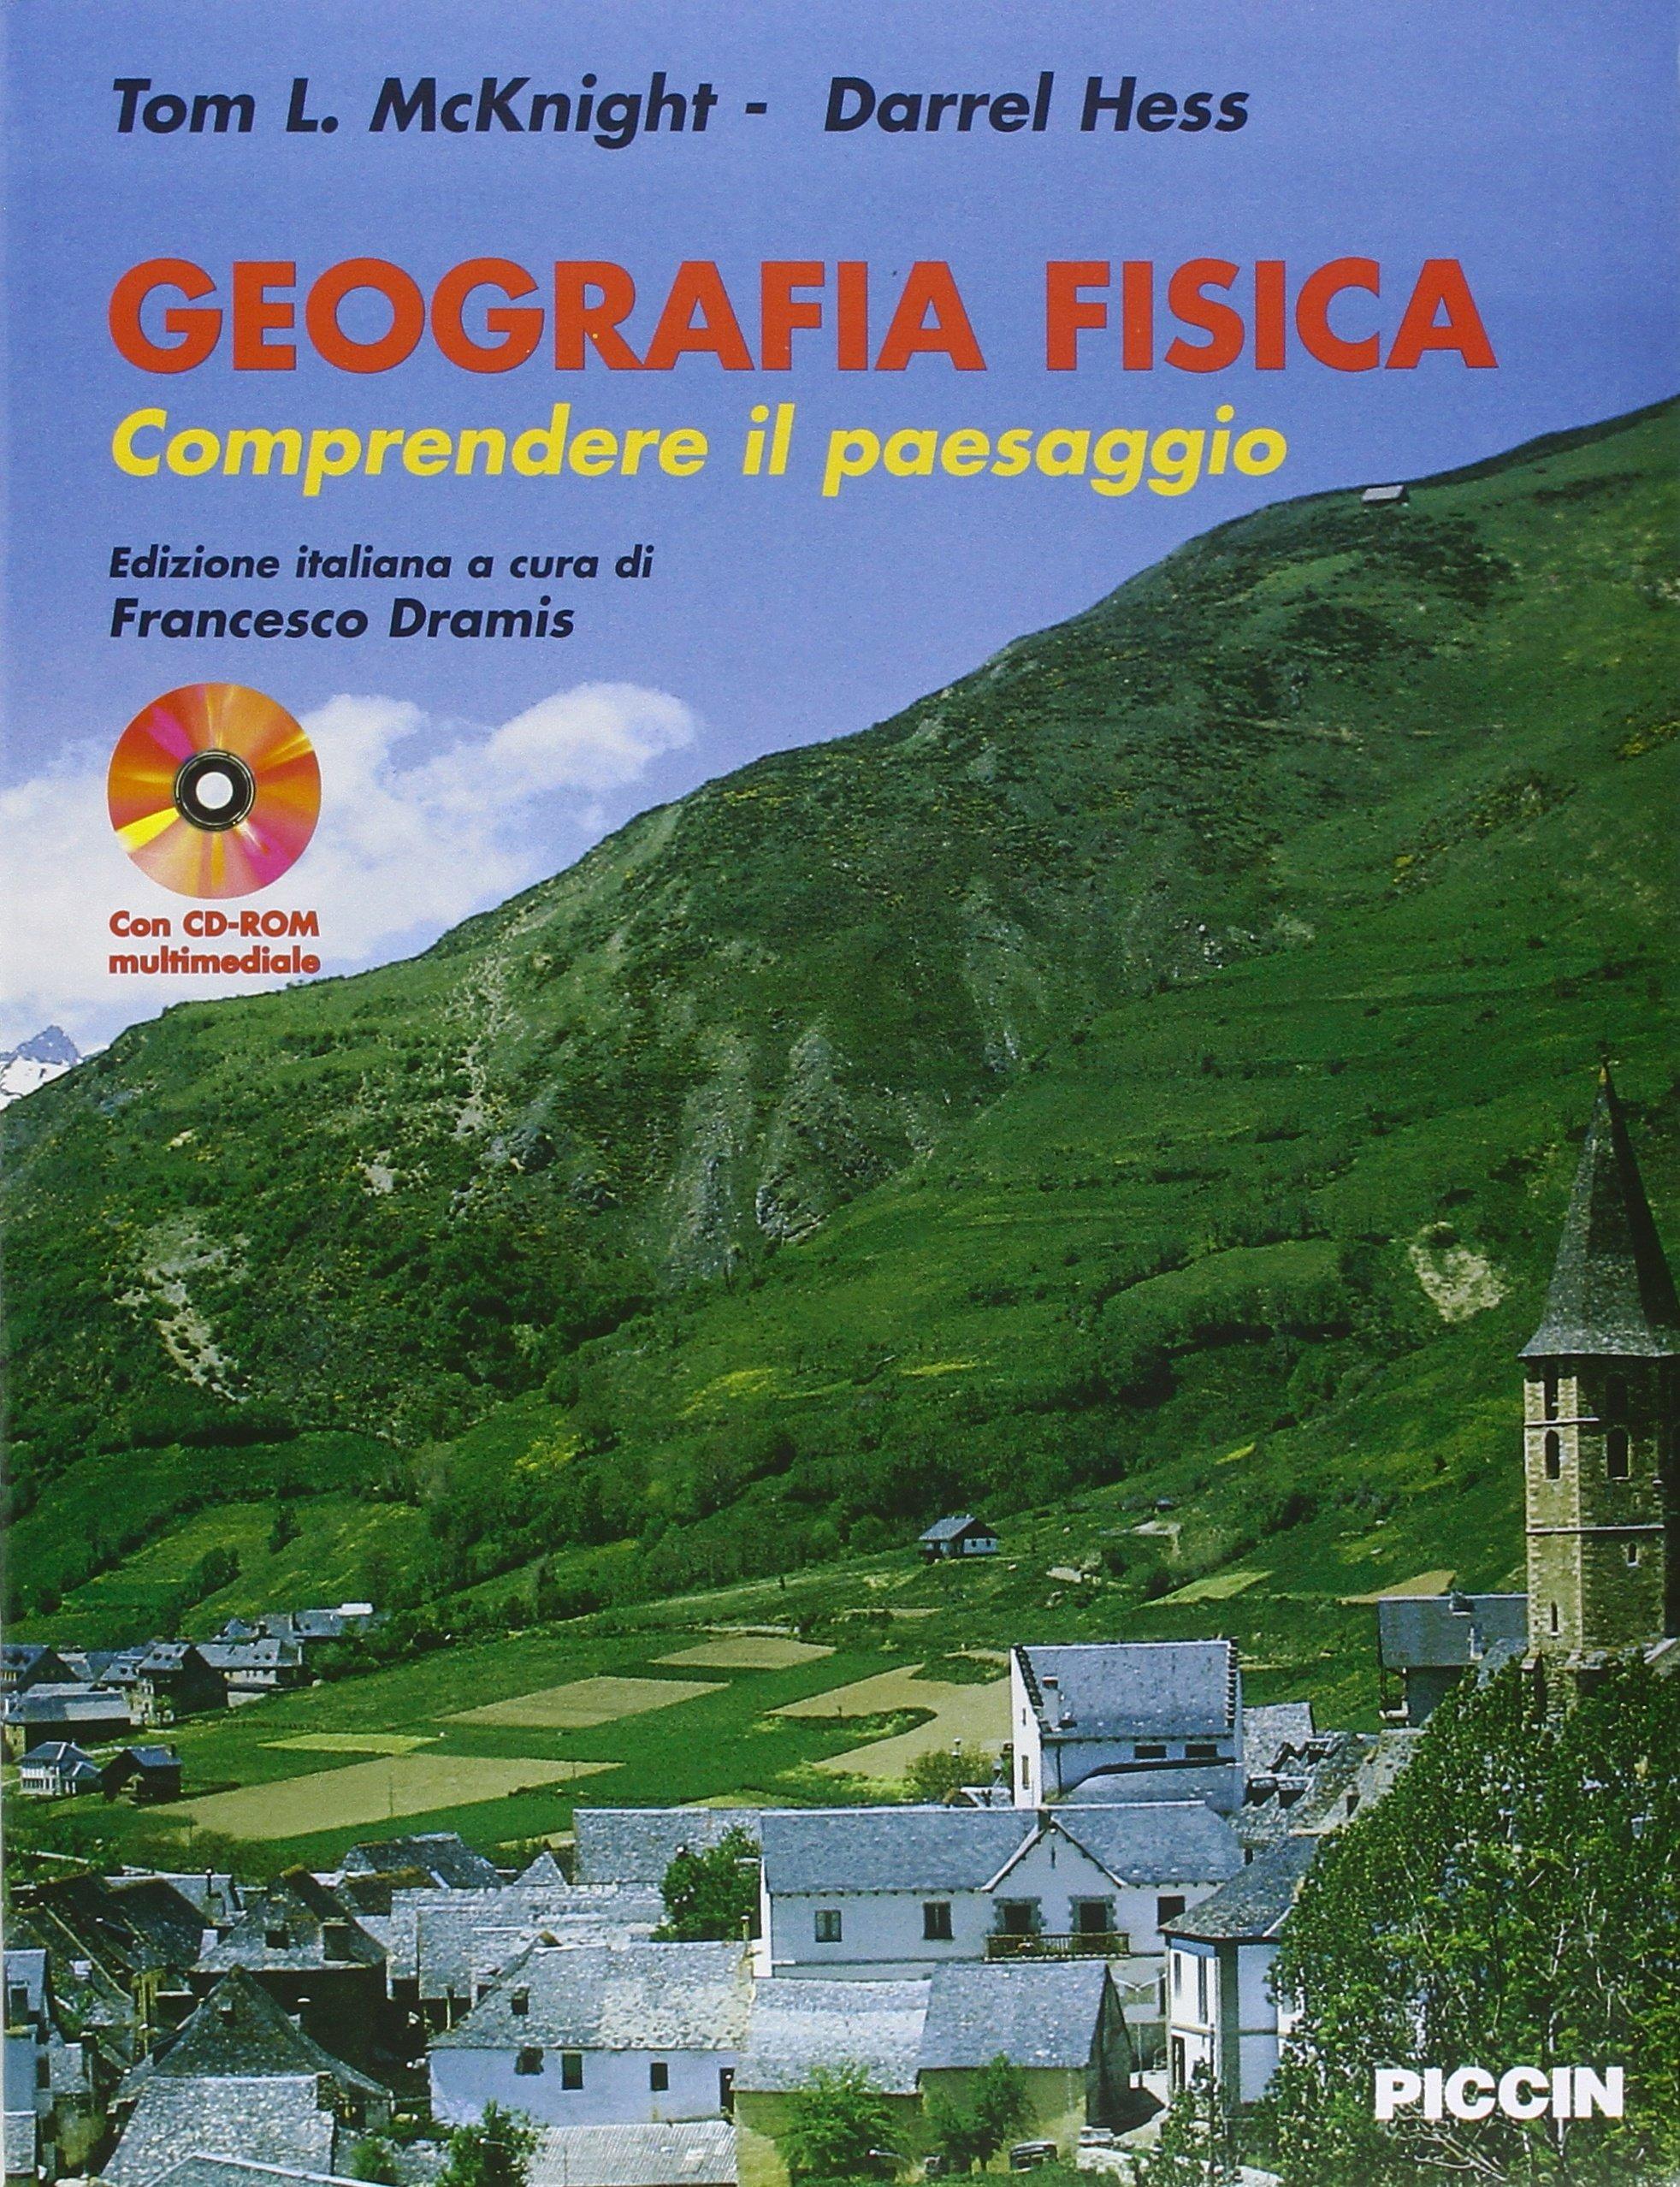 Geografia fisica. Comprendere il paesaggio: Amazon.es: McKnight, Tom L., Hess, Darrel, Dramis, F.: Libros en idiomas extranjeros